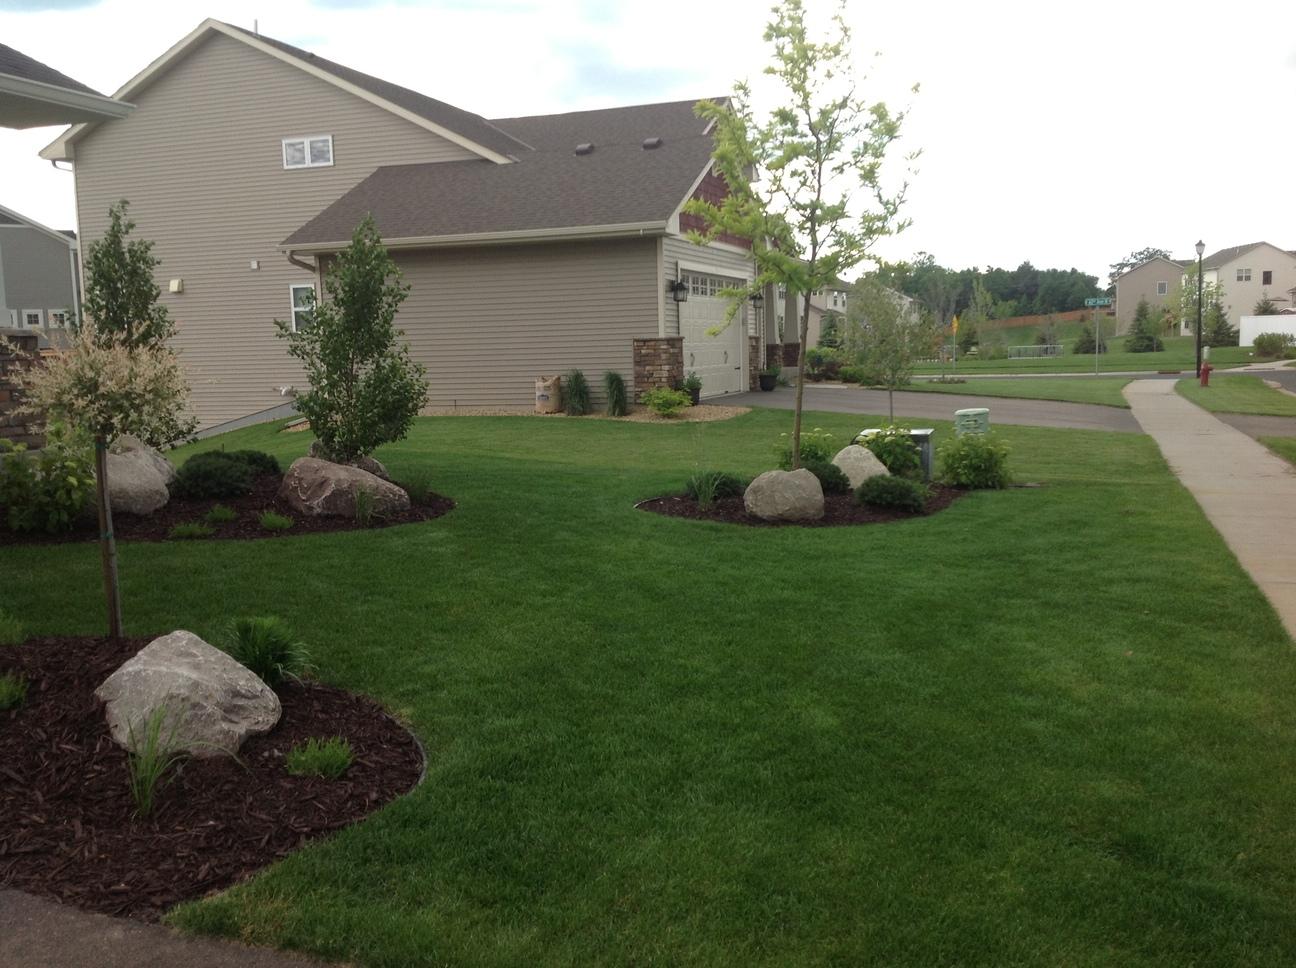 GroundWrx   Landscape & Hardscape Design: Plymouth, MN